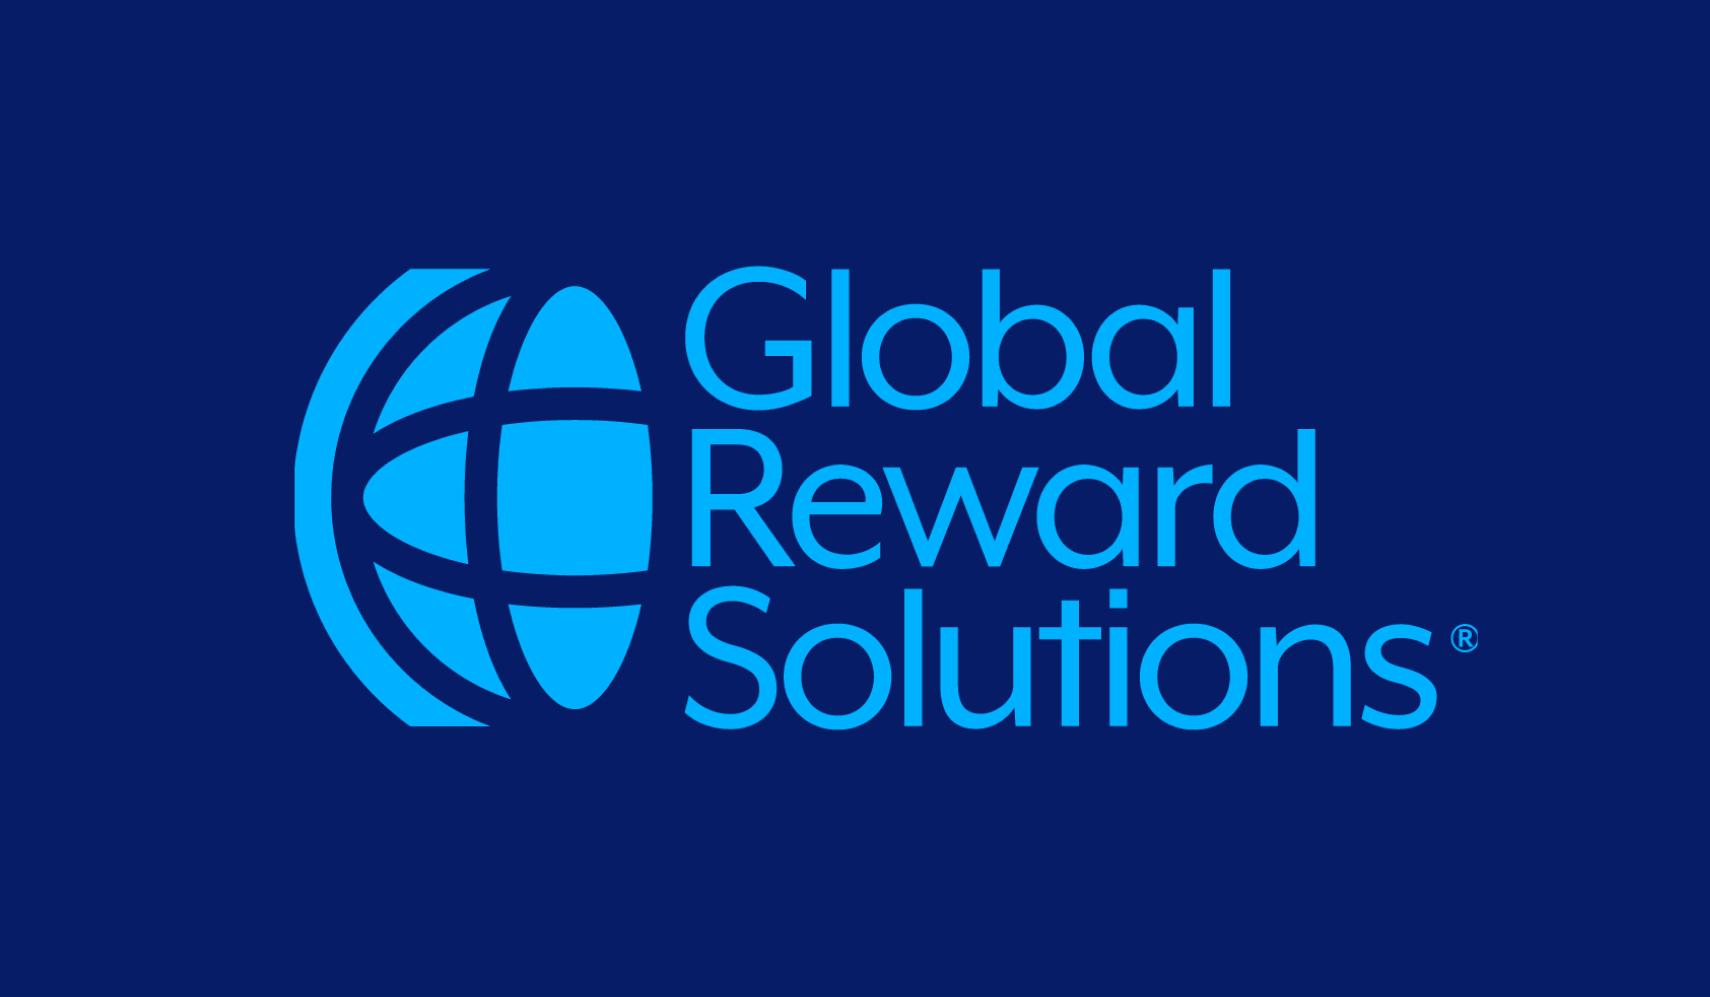 Global Reward Solutions